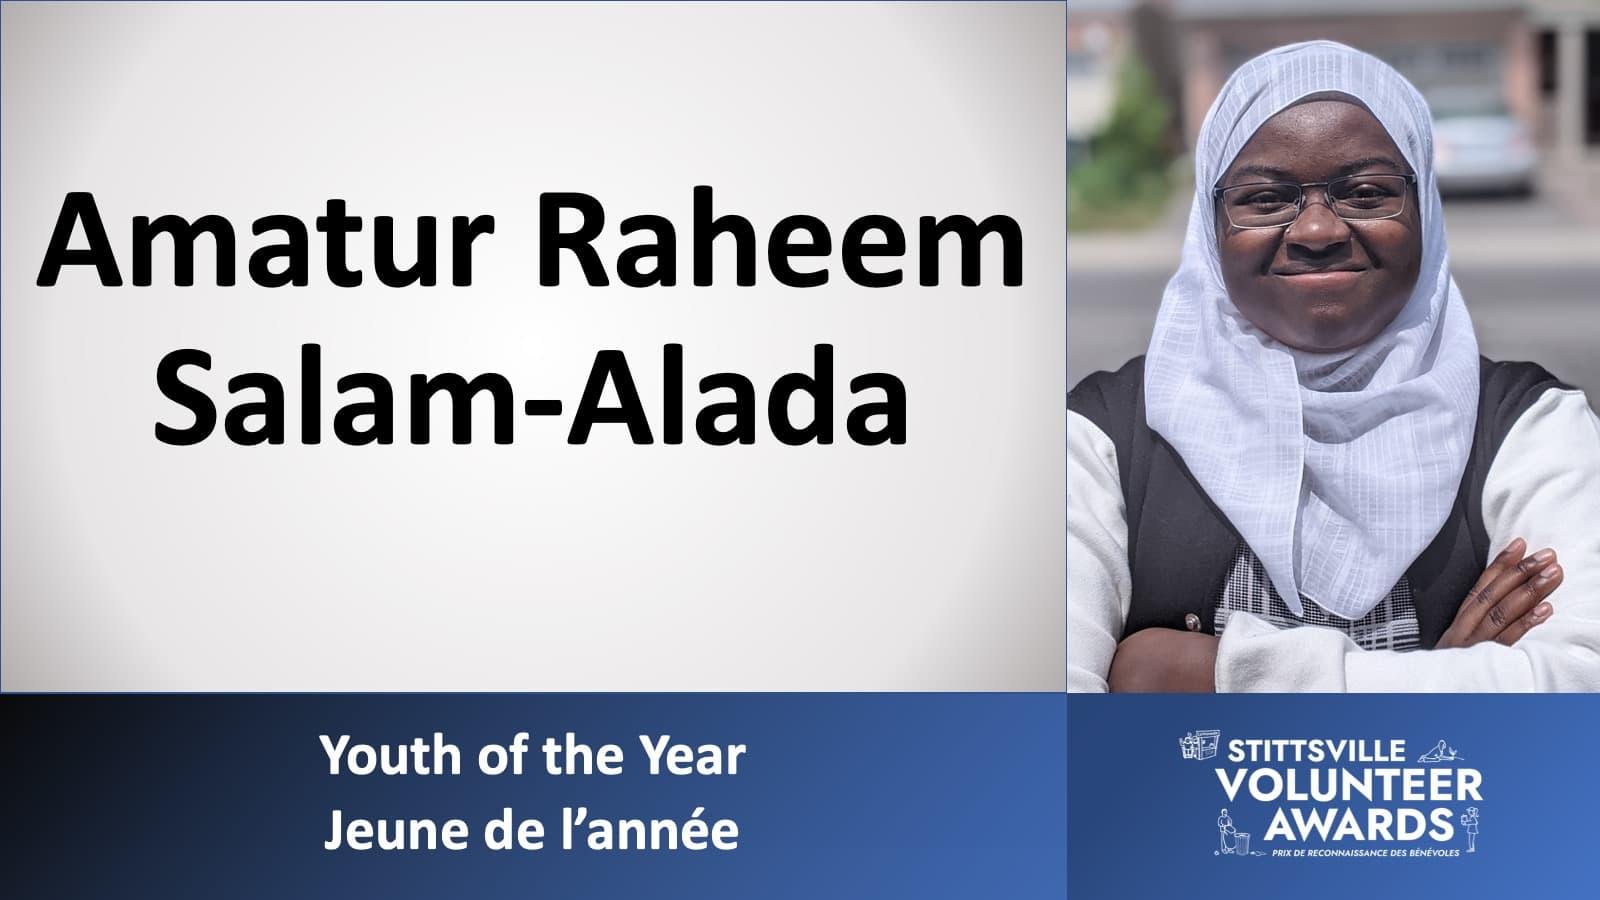 Amatur Raheem Salam-Alada